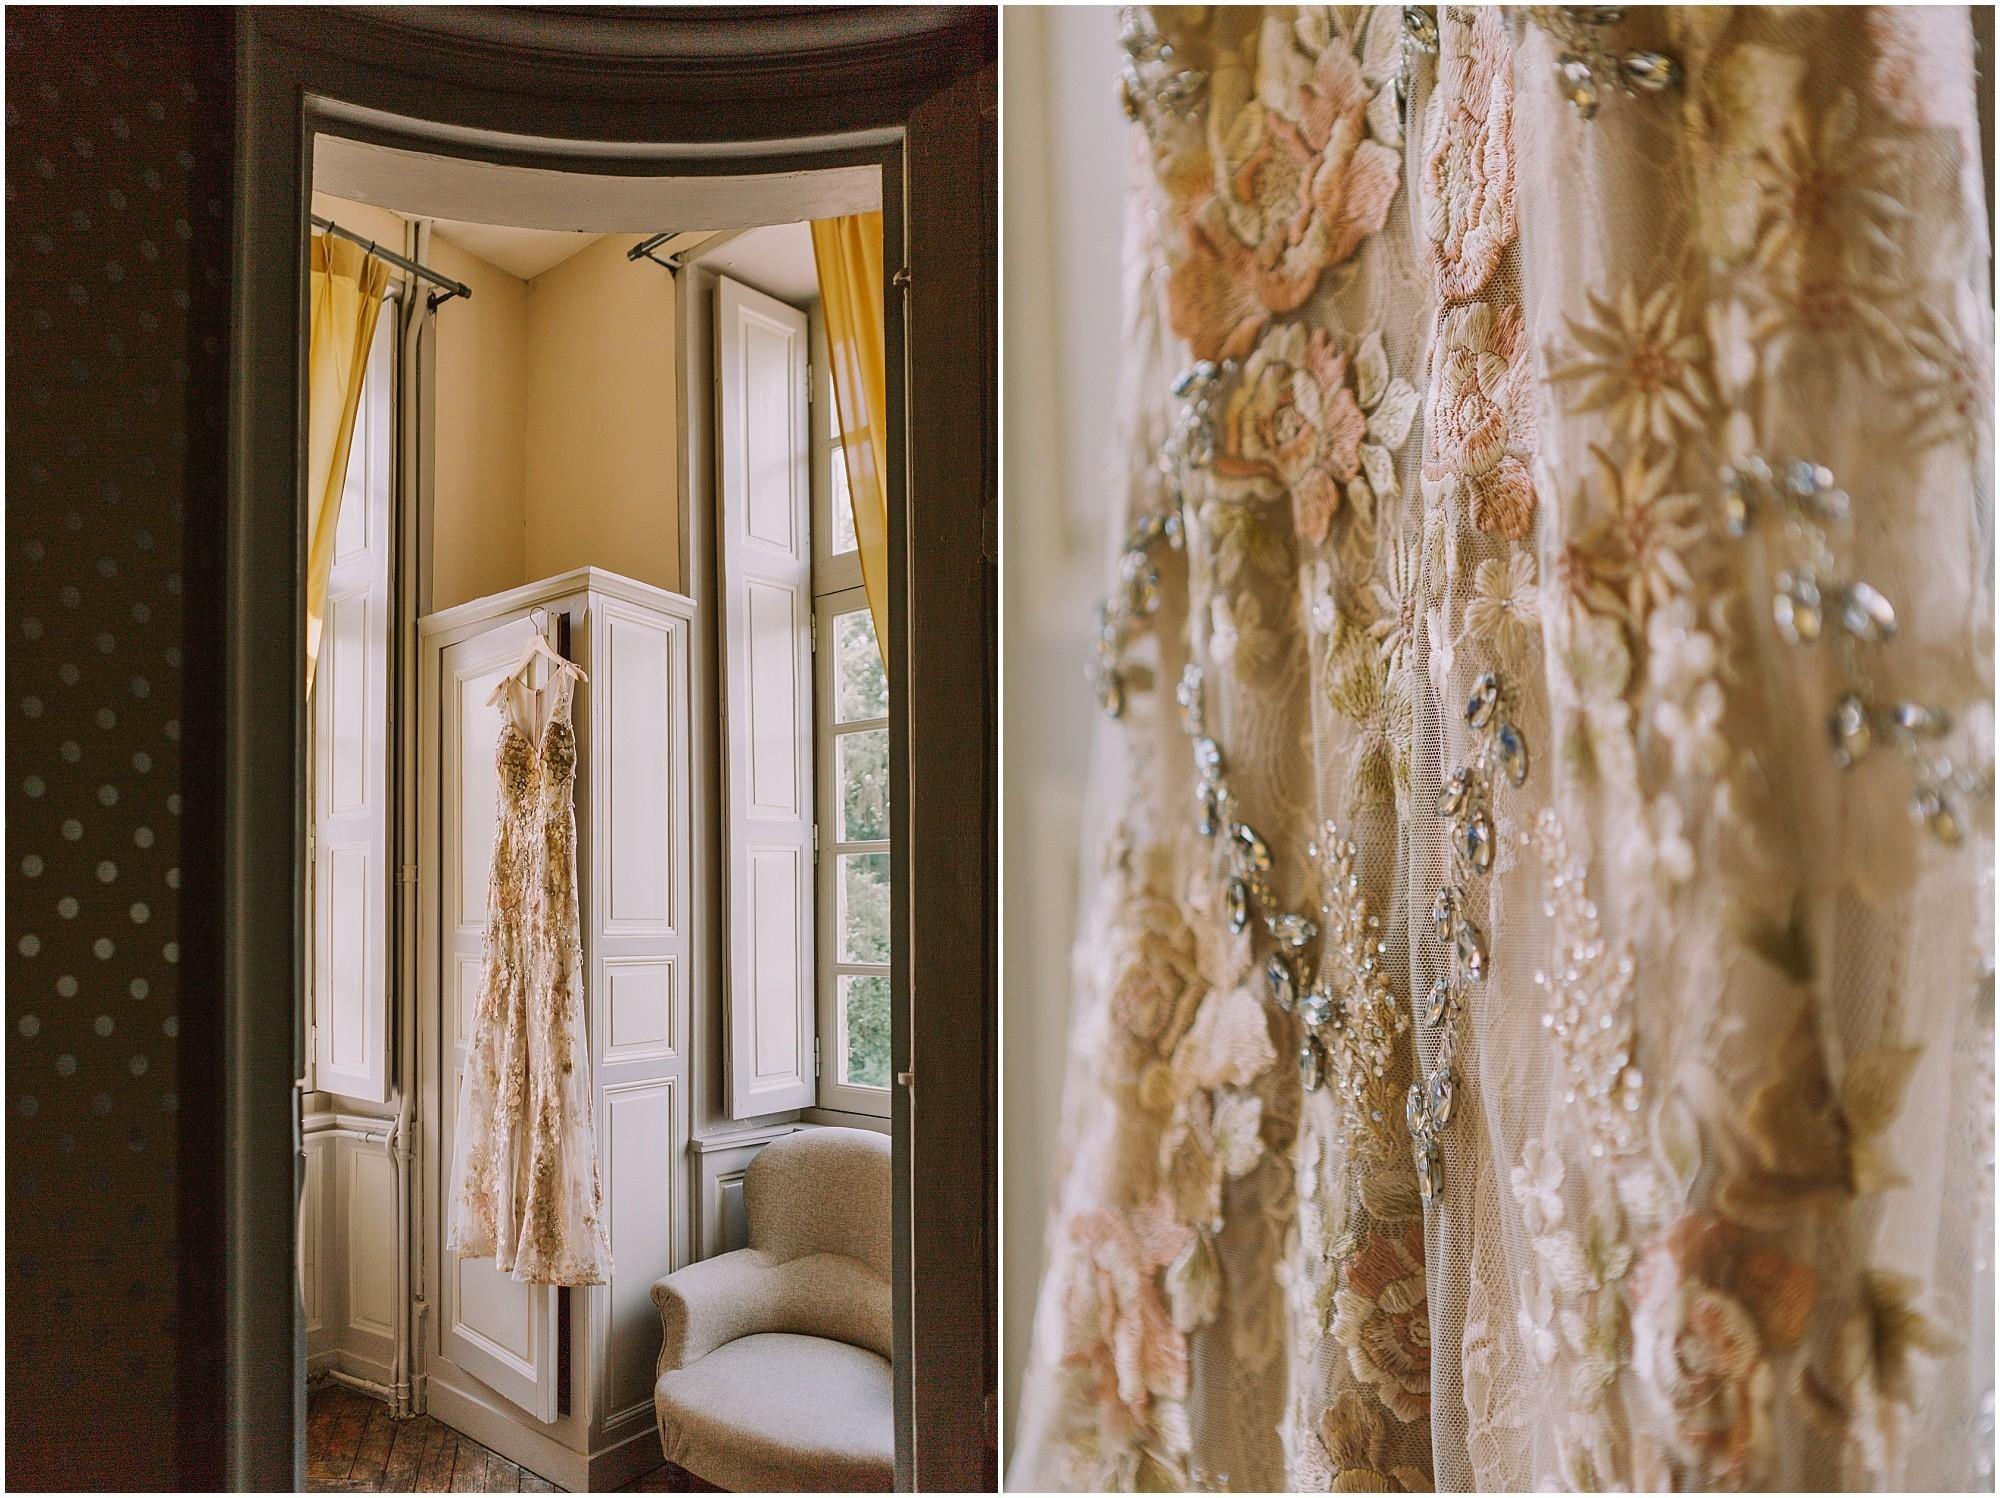 Kateryna-photos-photographer-mariage-chateau-saint-paterne-alencon-normandie-mayenne-le-mans_0006.jpg